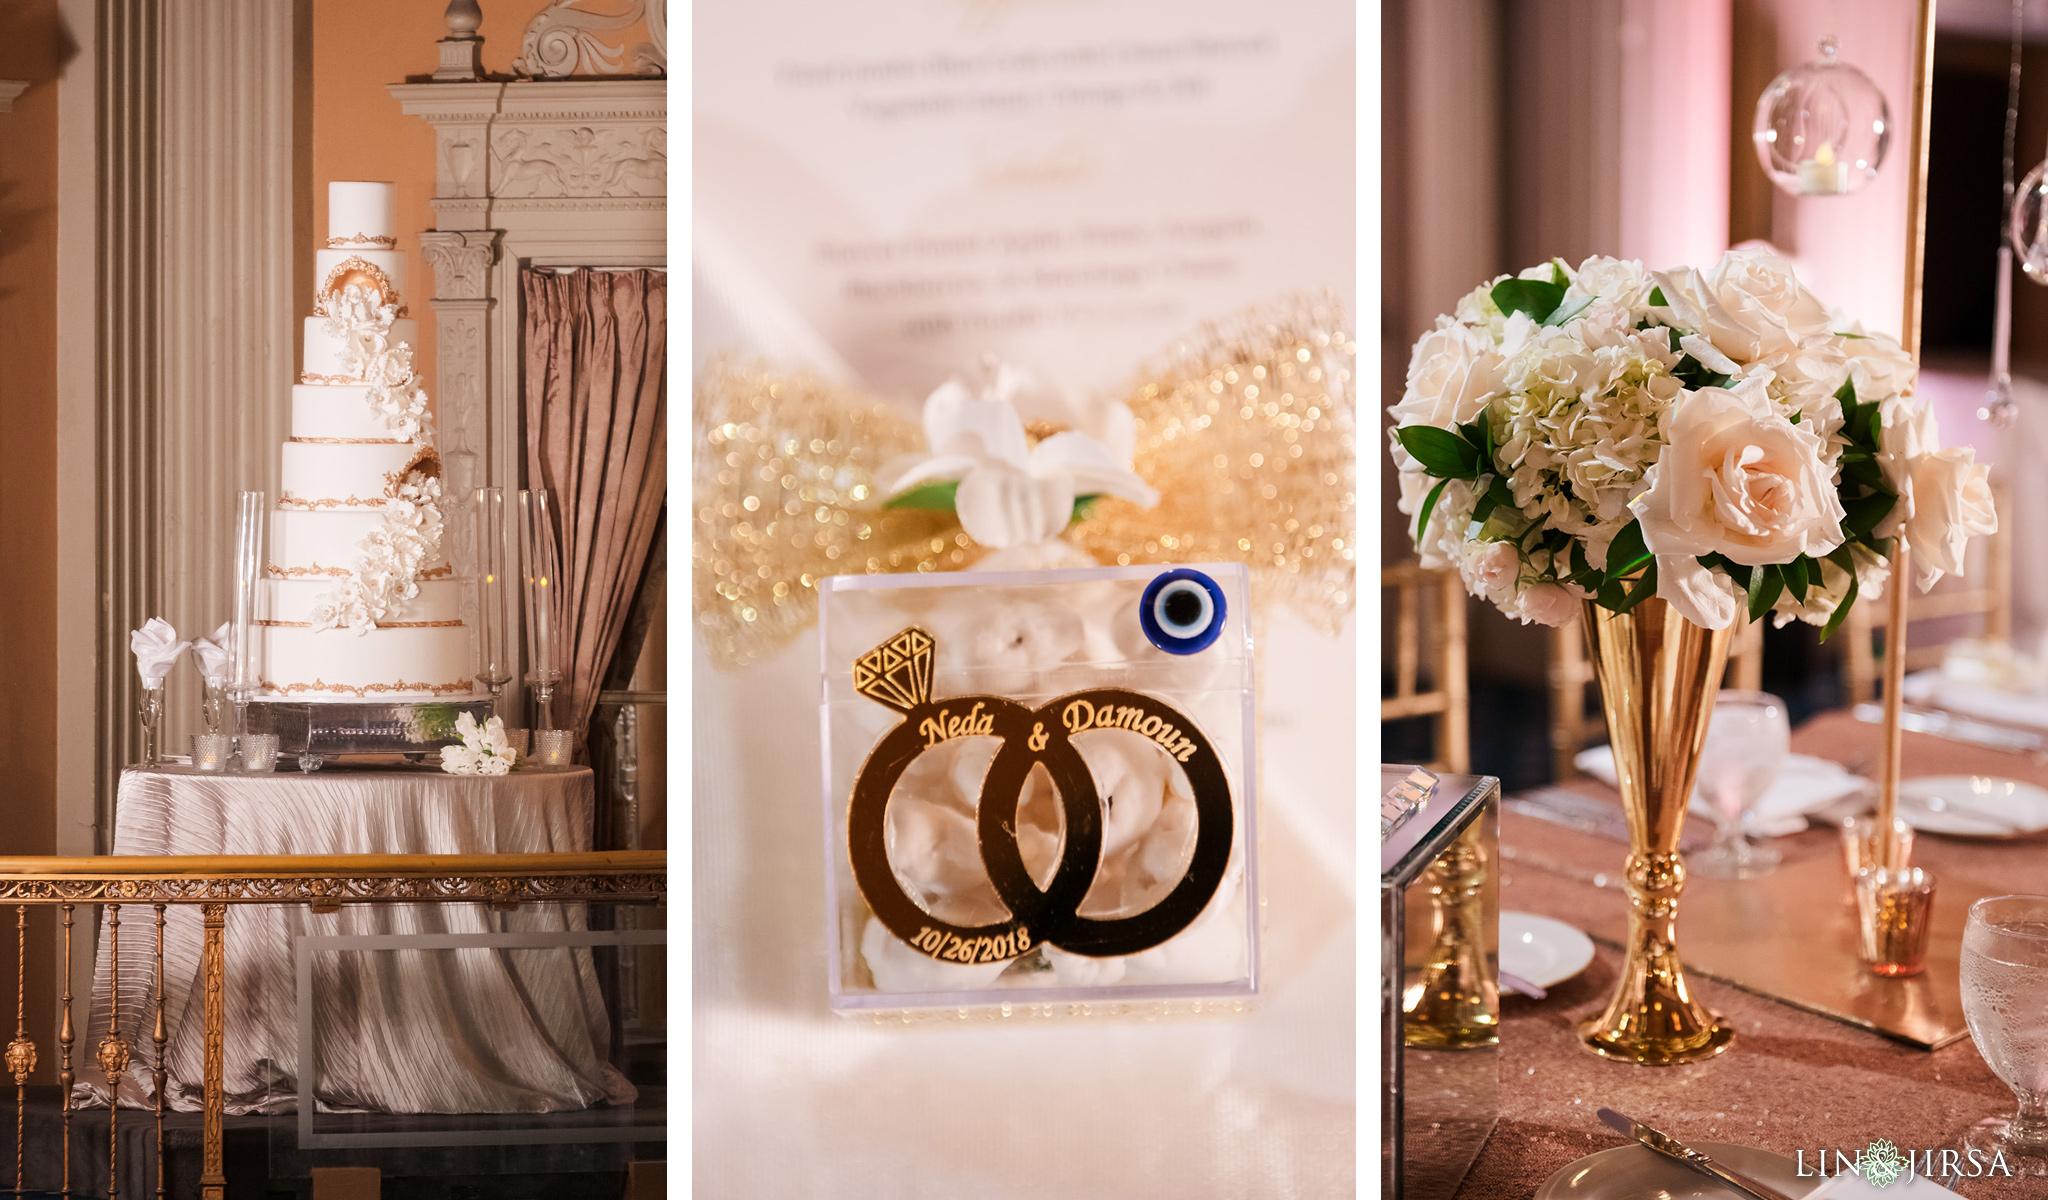 25 Biltmore Hotel Los Angeles Wedding Photography